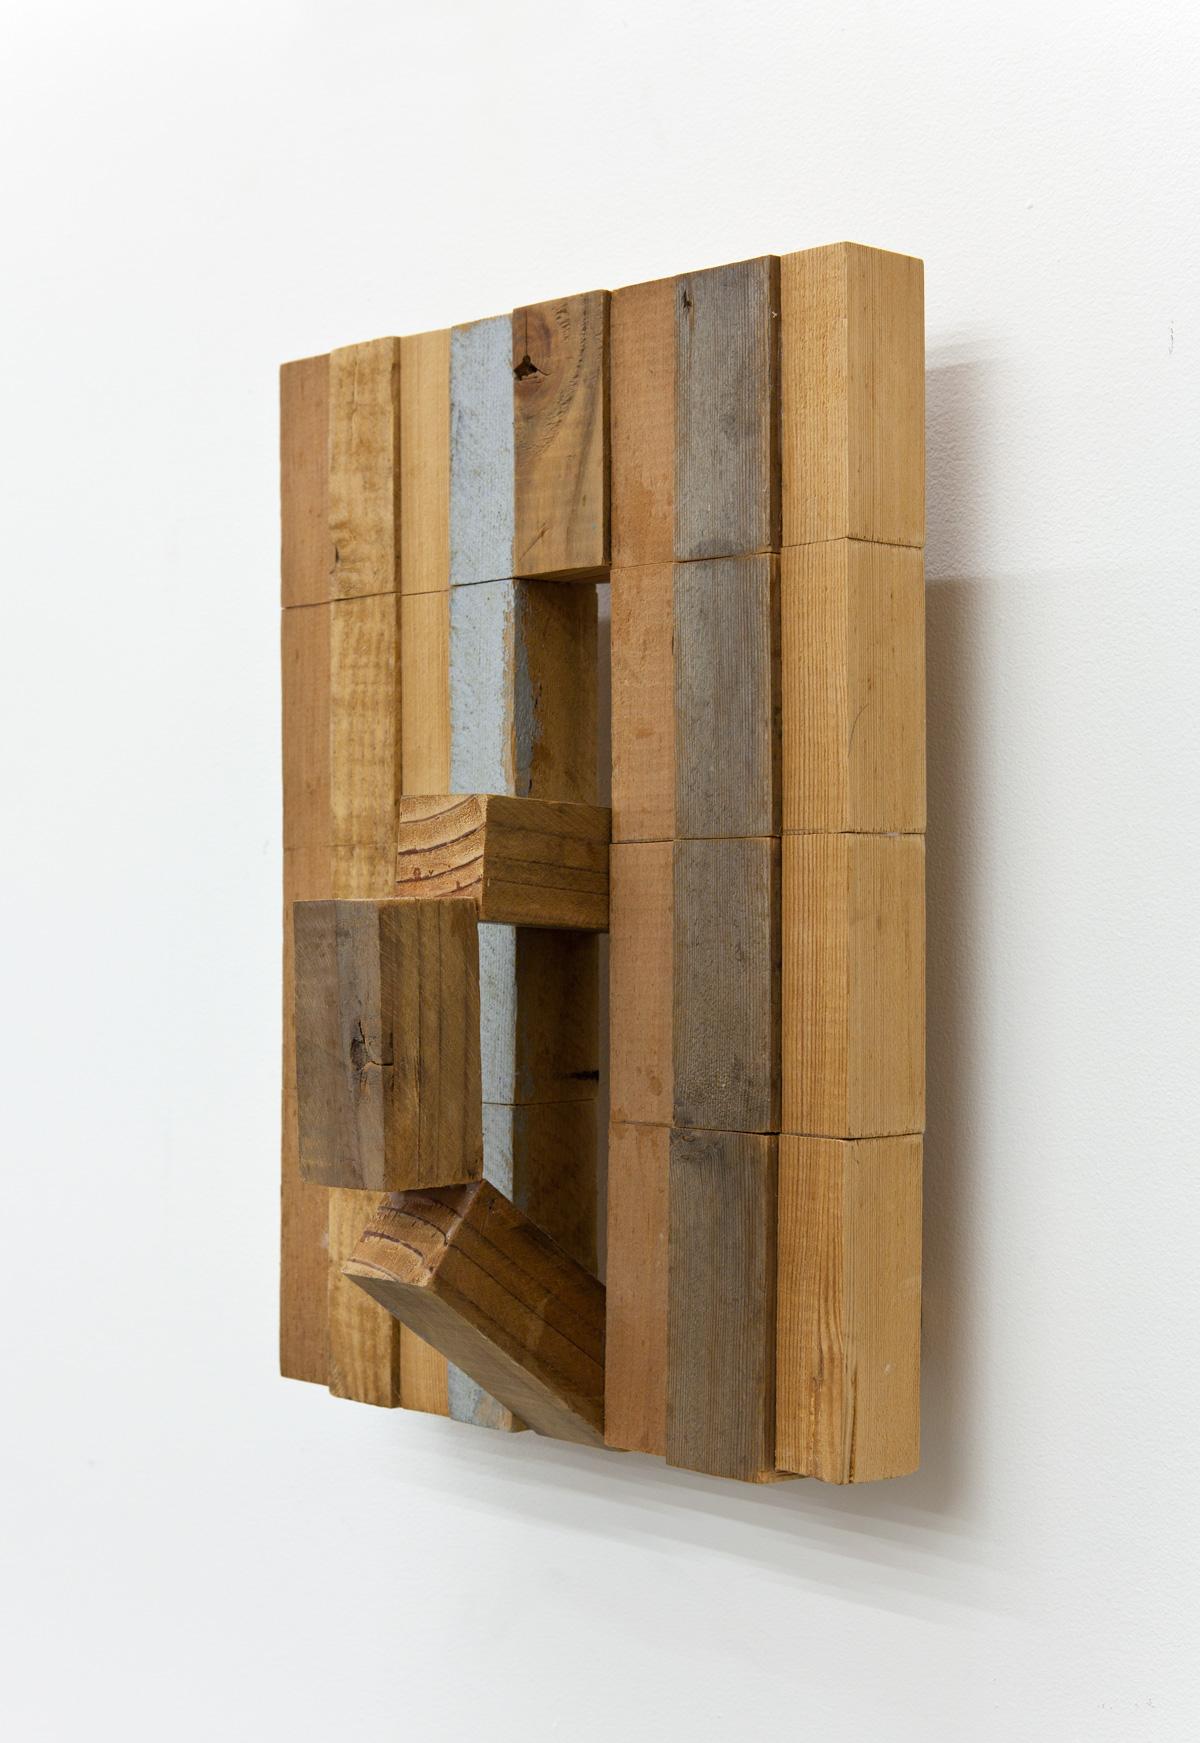 Plural Existences , 2007 複因素 ( Fukuinso ) Wood, acrylic 16 1/2 x 11 3/8 x 7 1/16 inches 42 x 29 x 18 cm